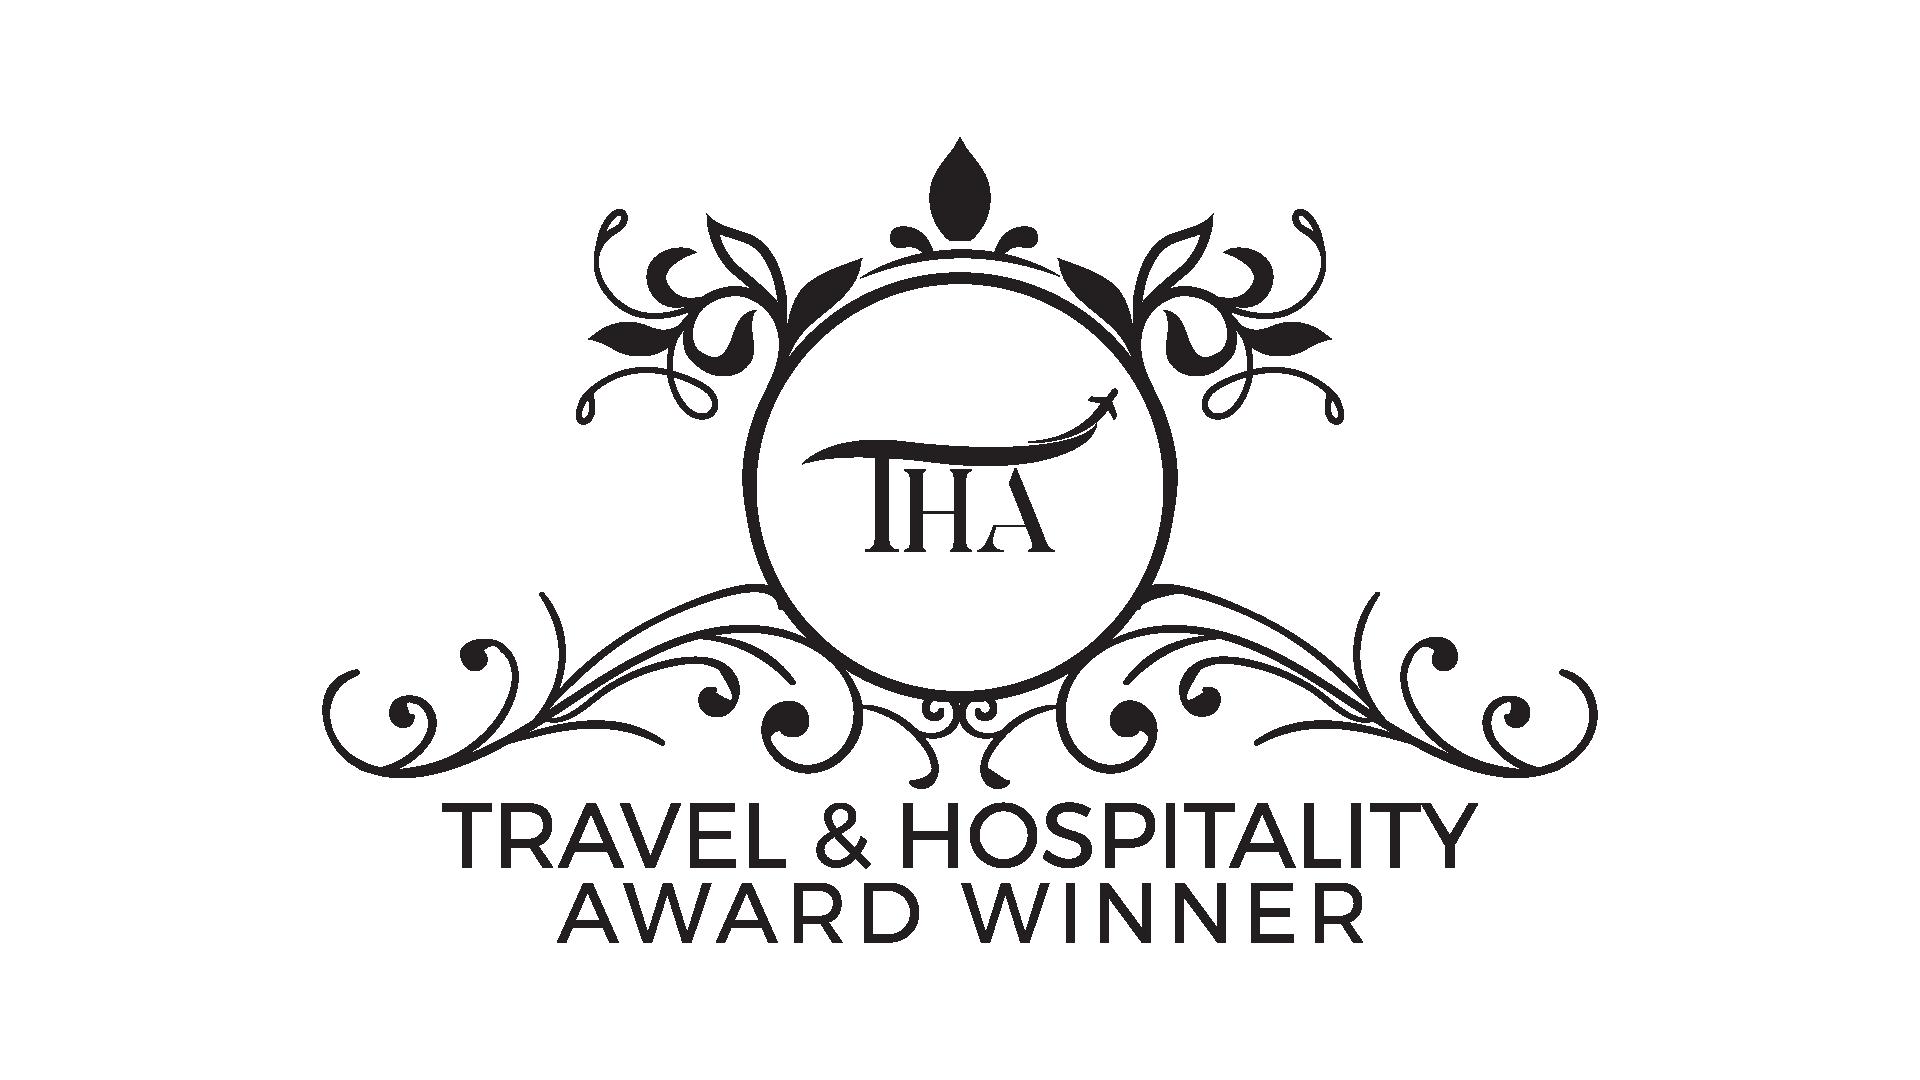 Travel And Hospitality Award Winner Logo Black-01.png